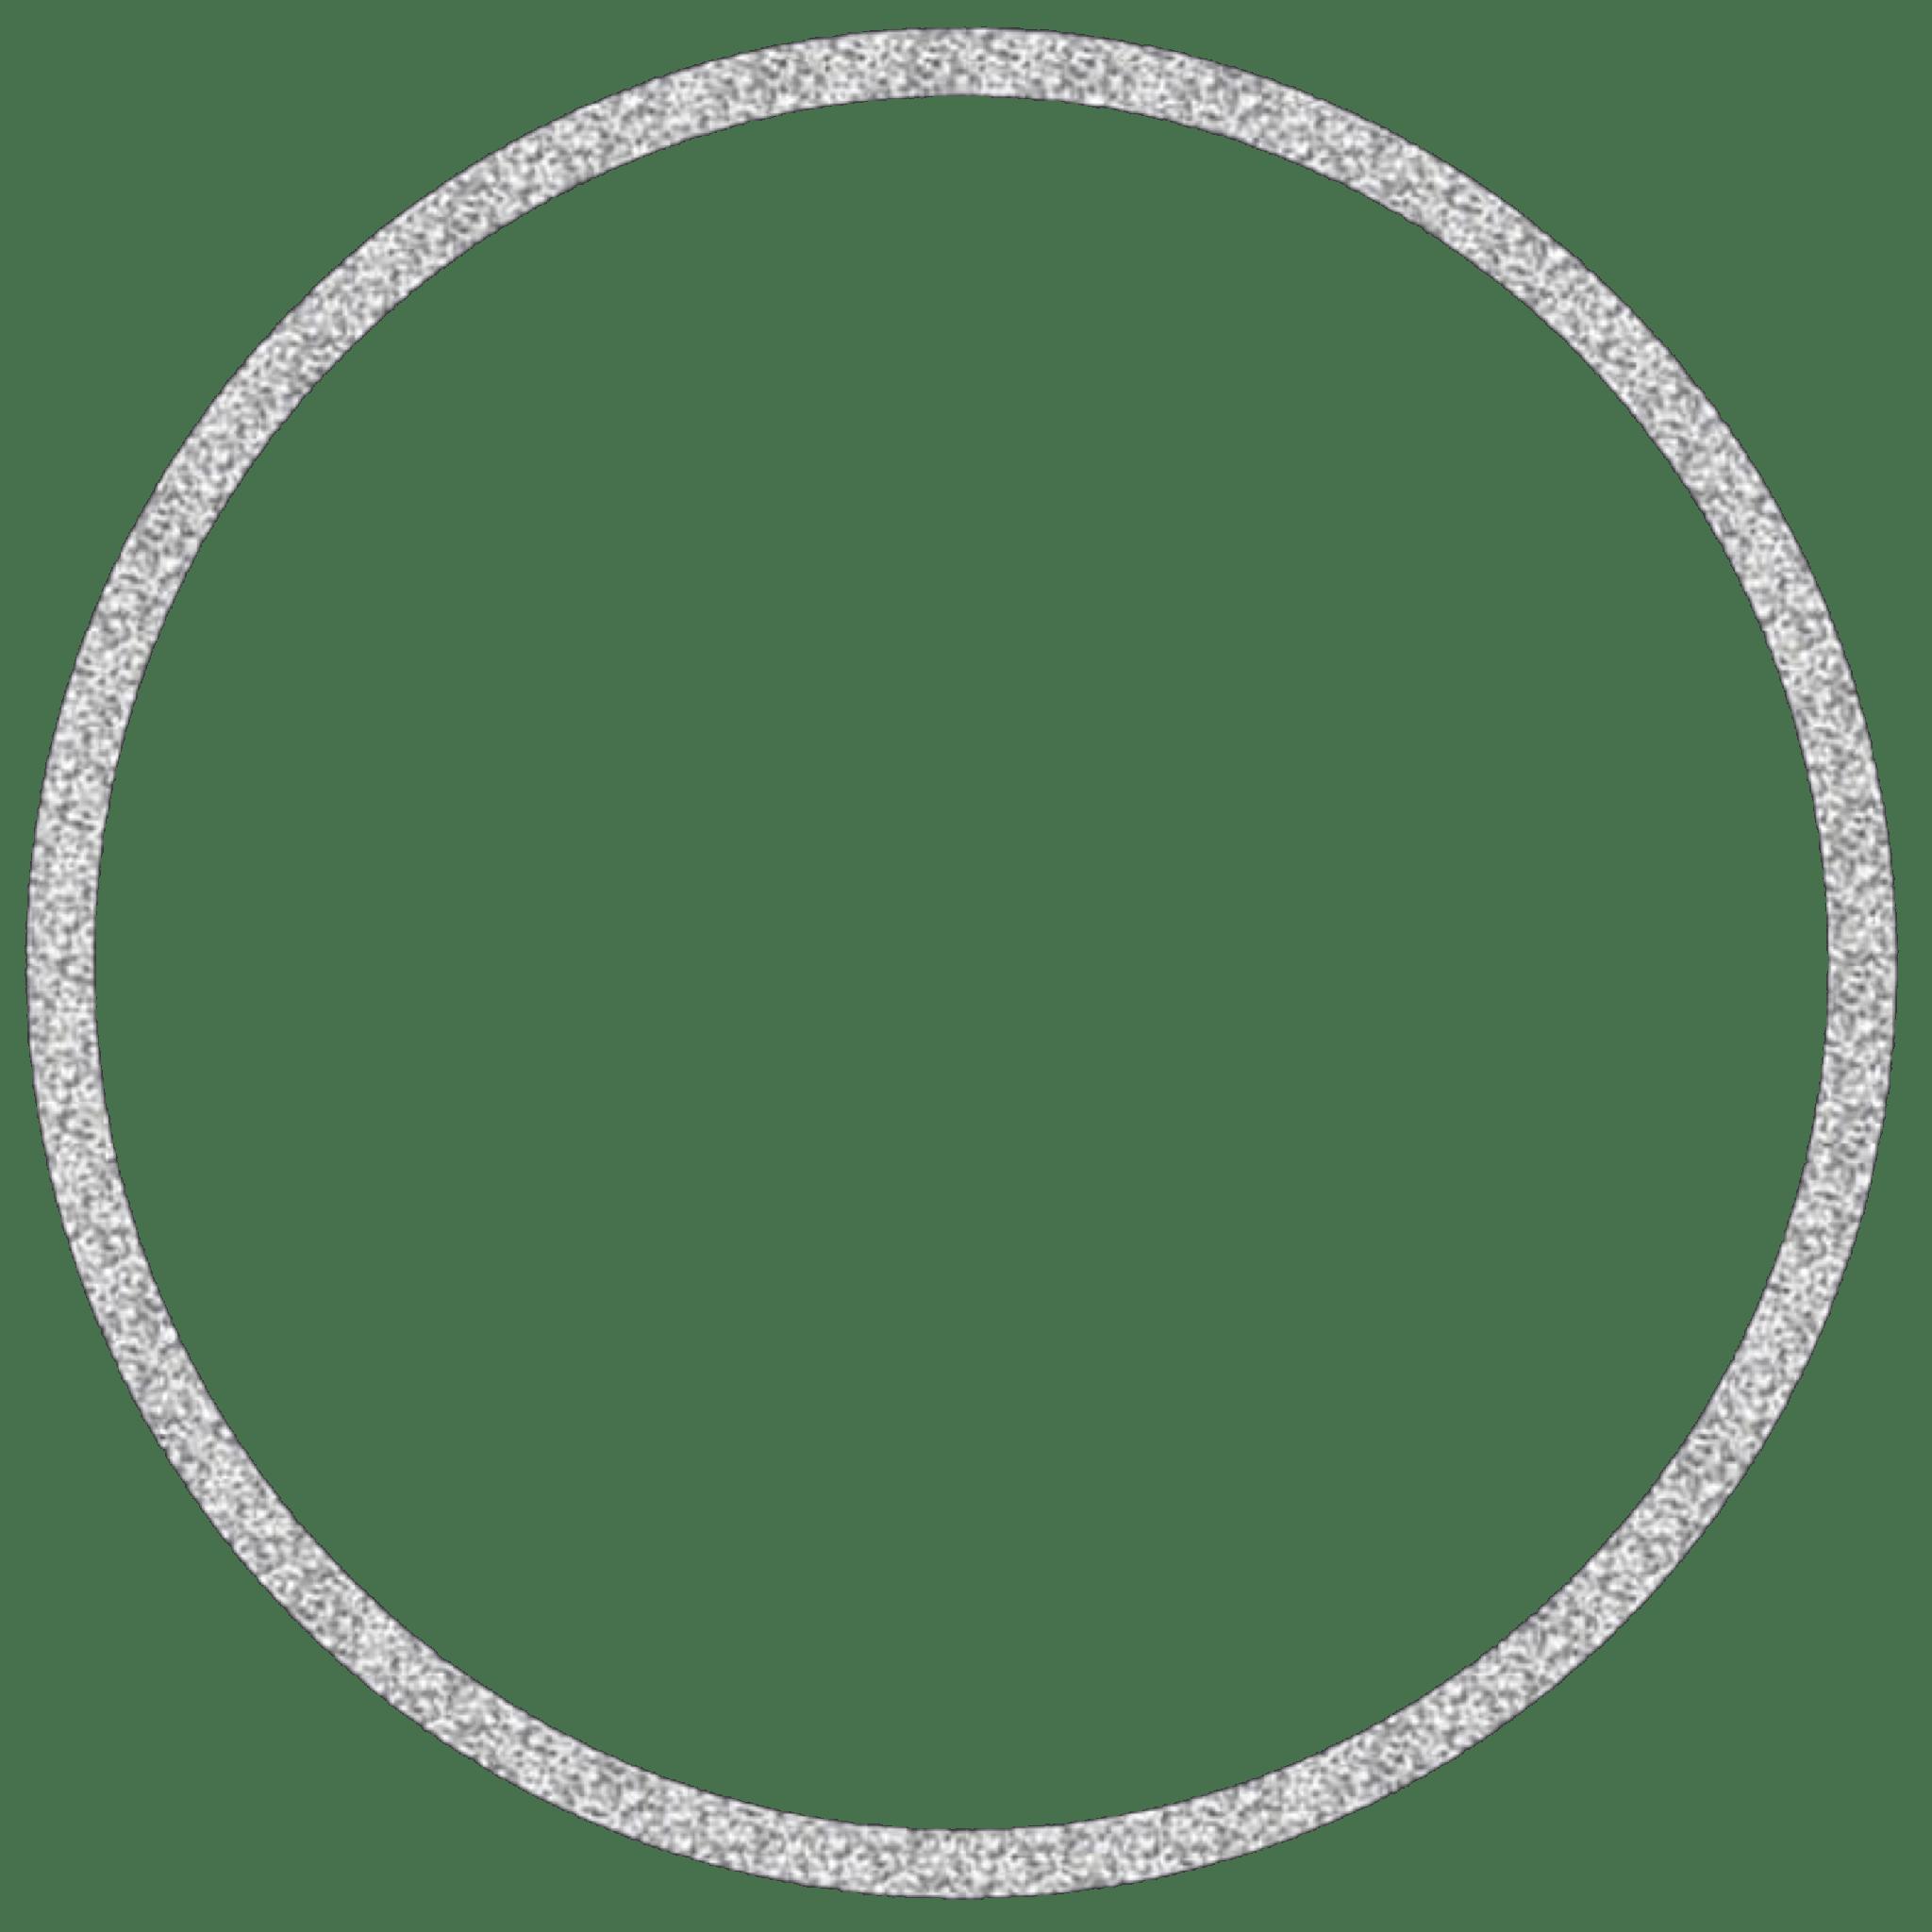 Circle Silver Silvercircle Glitter Frame Circleframe